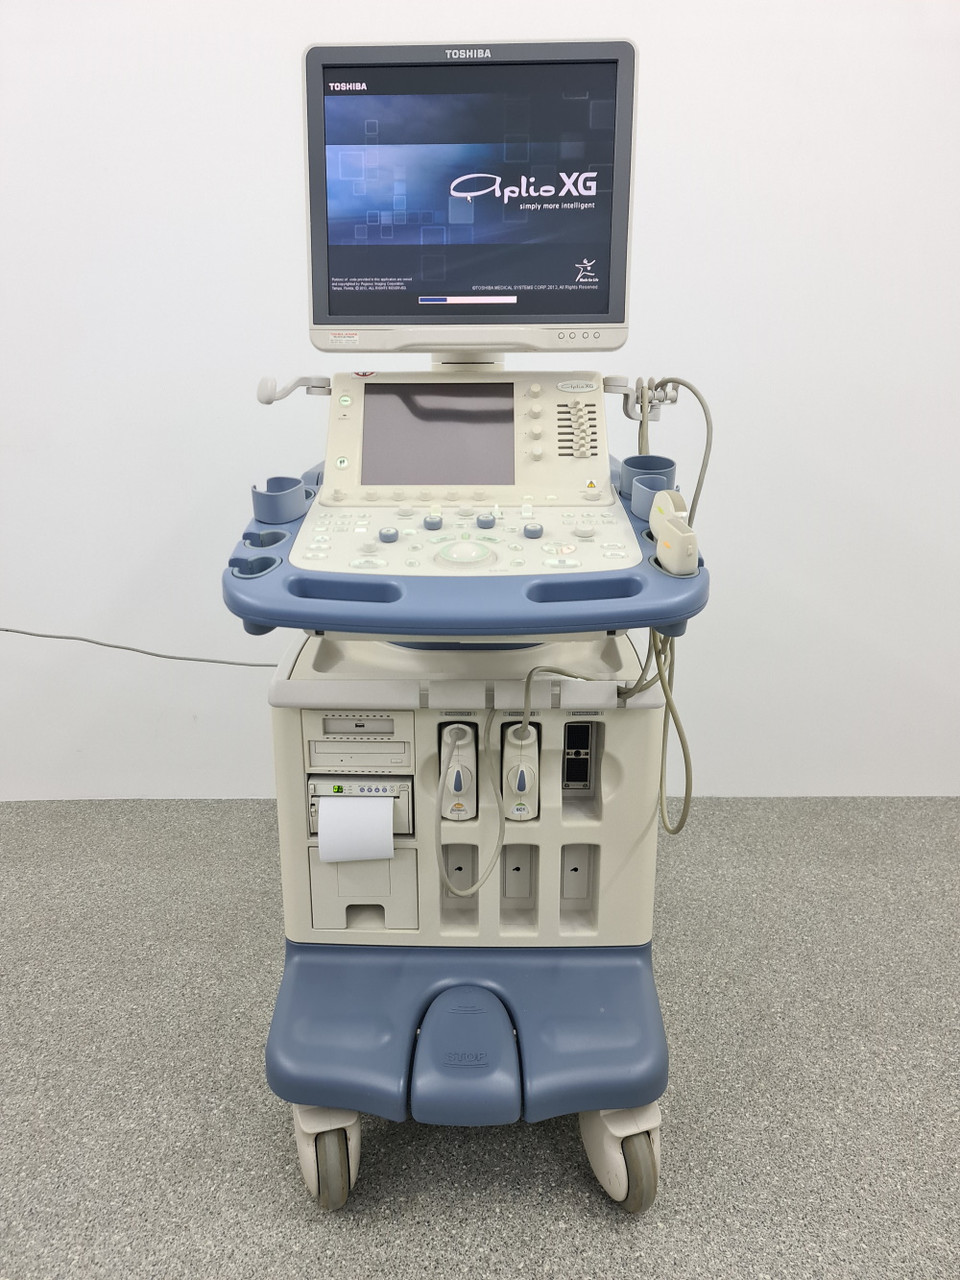 Toshiba Aplio XG (SSA-790A) + 2 датчика УЗИ аппарат